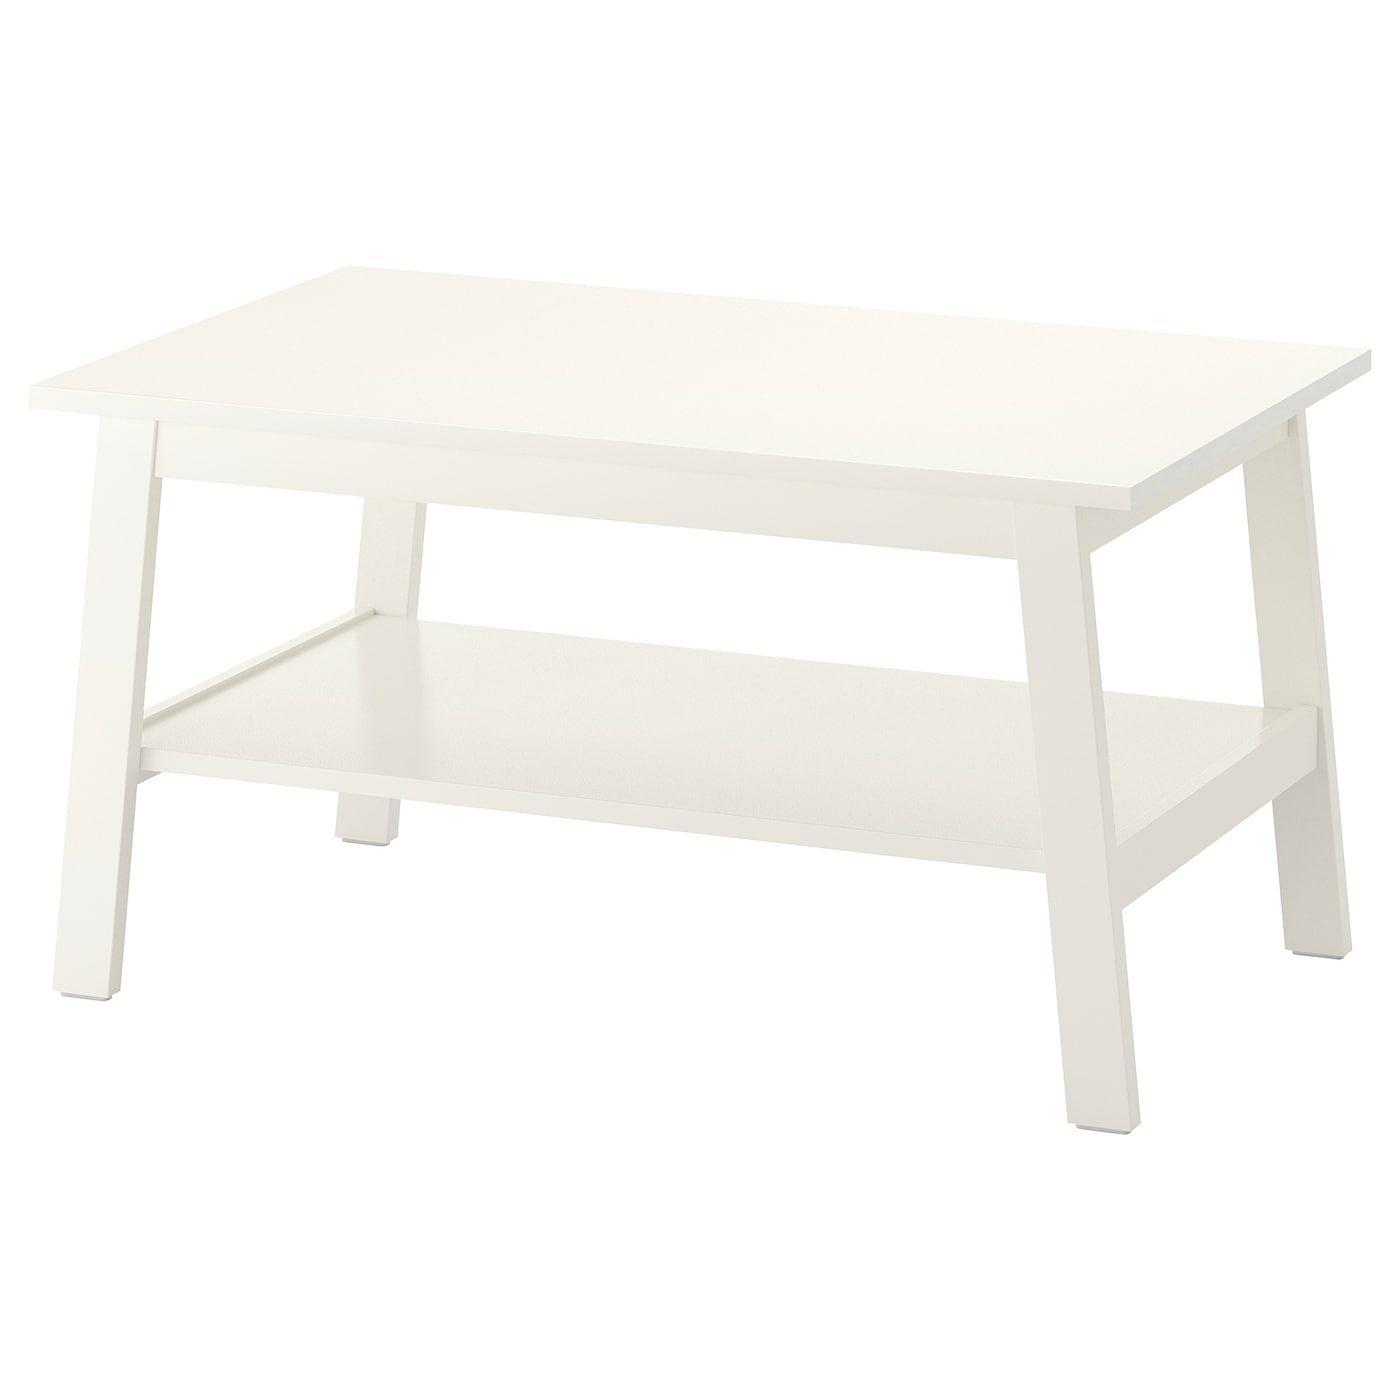 Lunnarp Coffee Table White 353 8x215 8 90x55 Cm Ikea Coffee Table White Coffee Table Ikea Side Table [ 1400 x 1400 Pixel ]